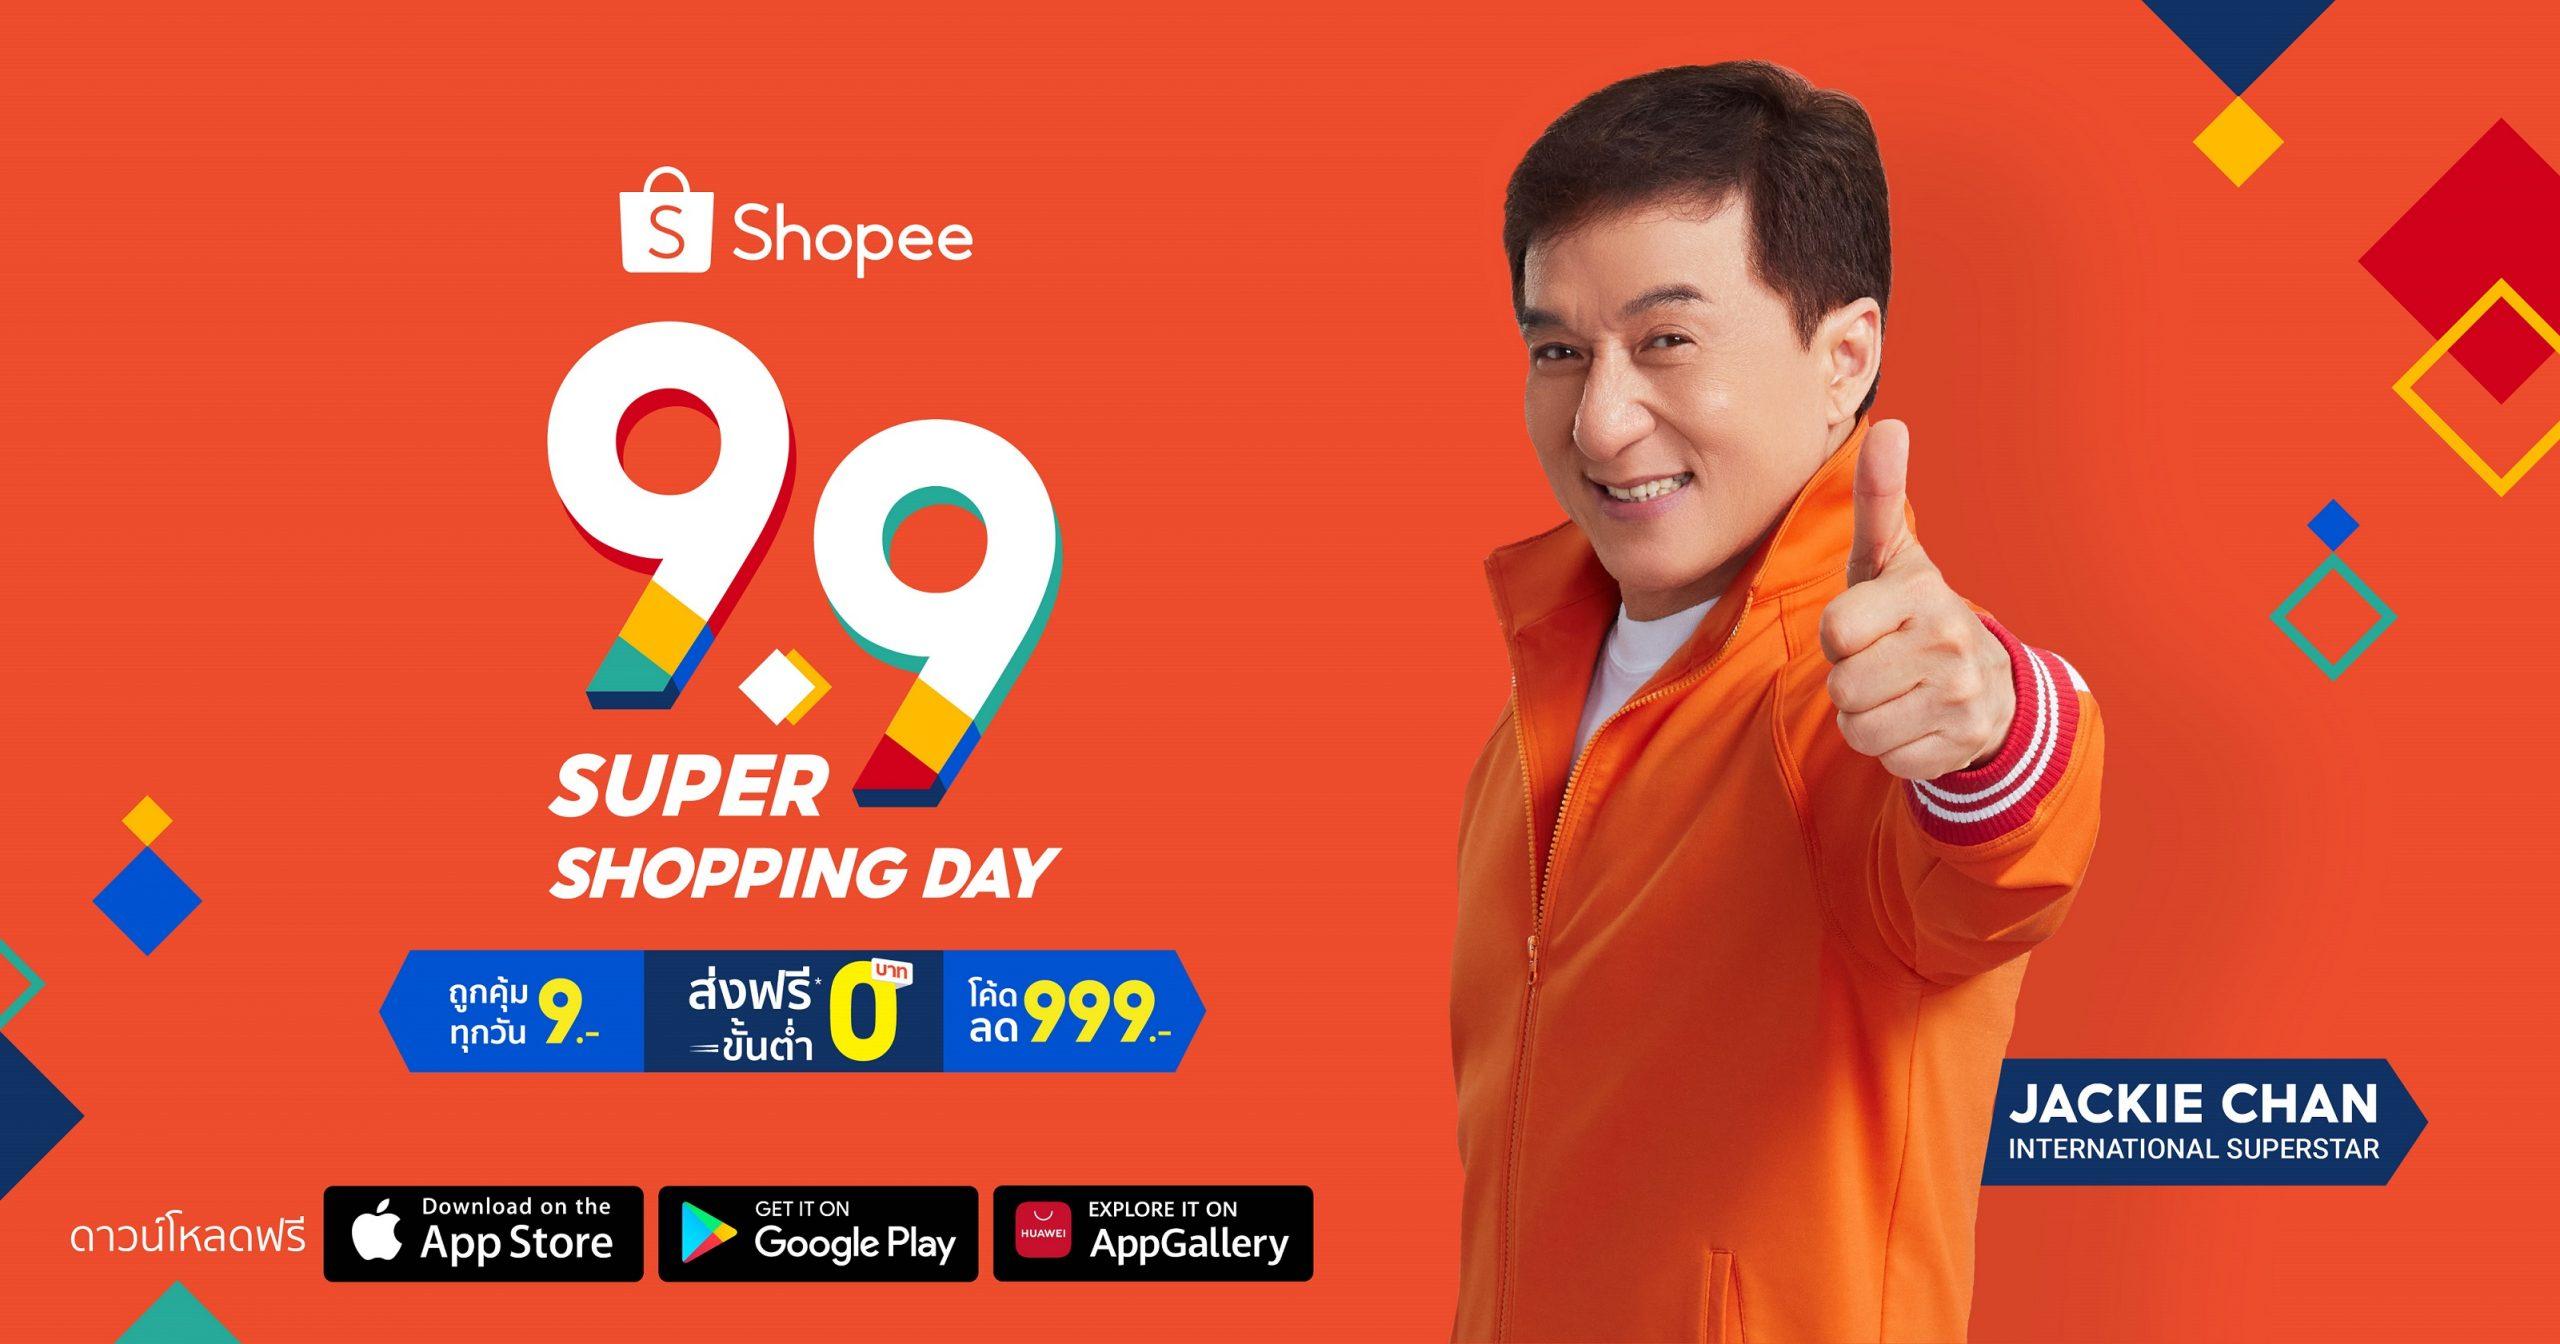 Shopee Shopee 9.9 Super Shopping Day